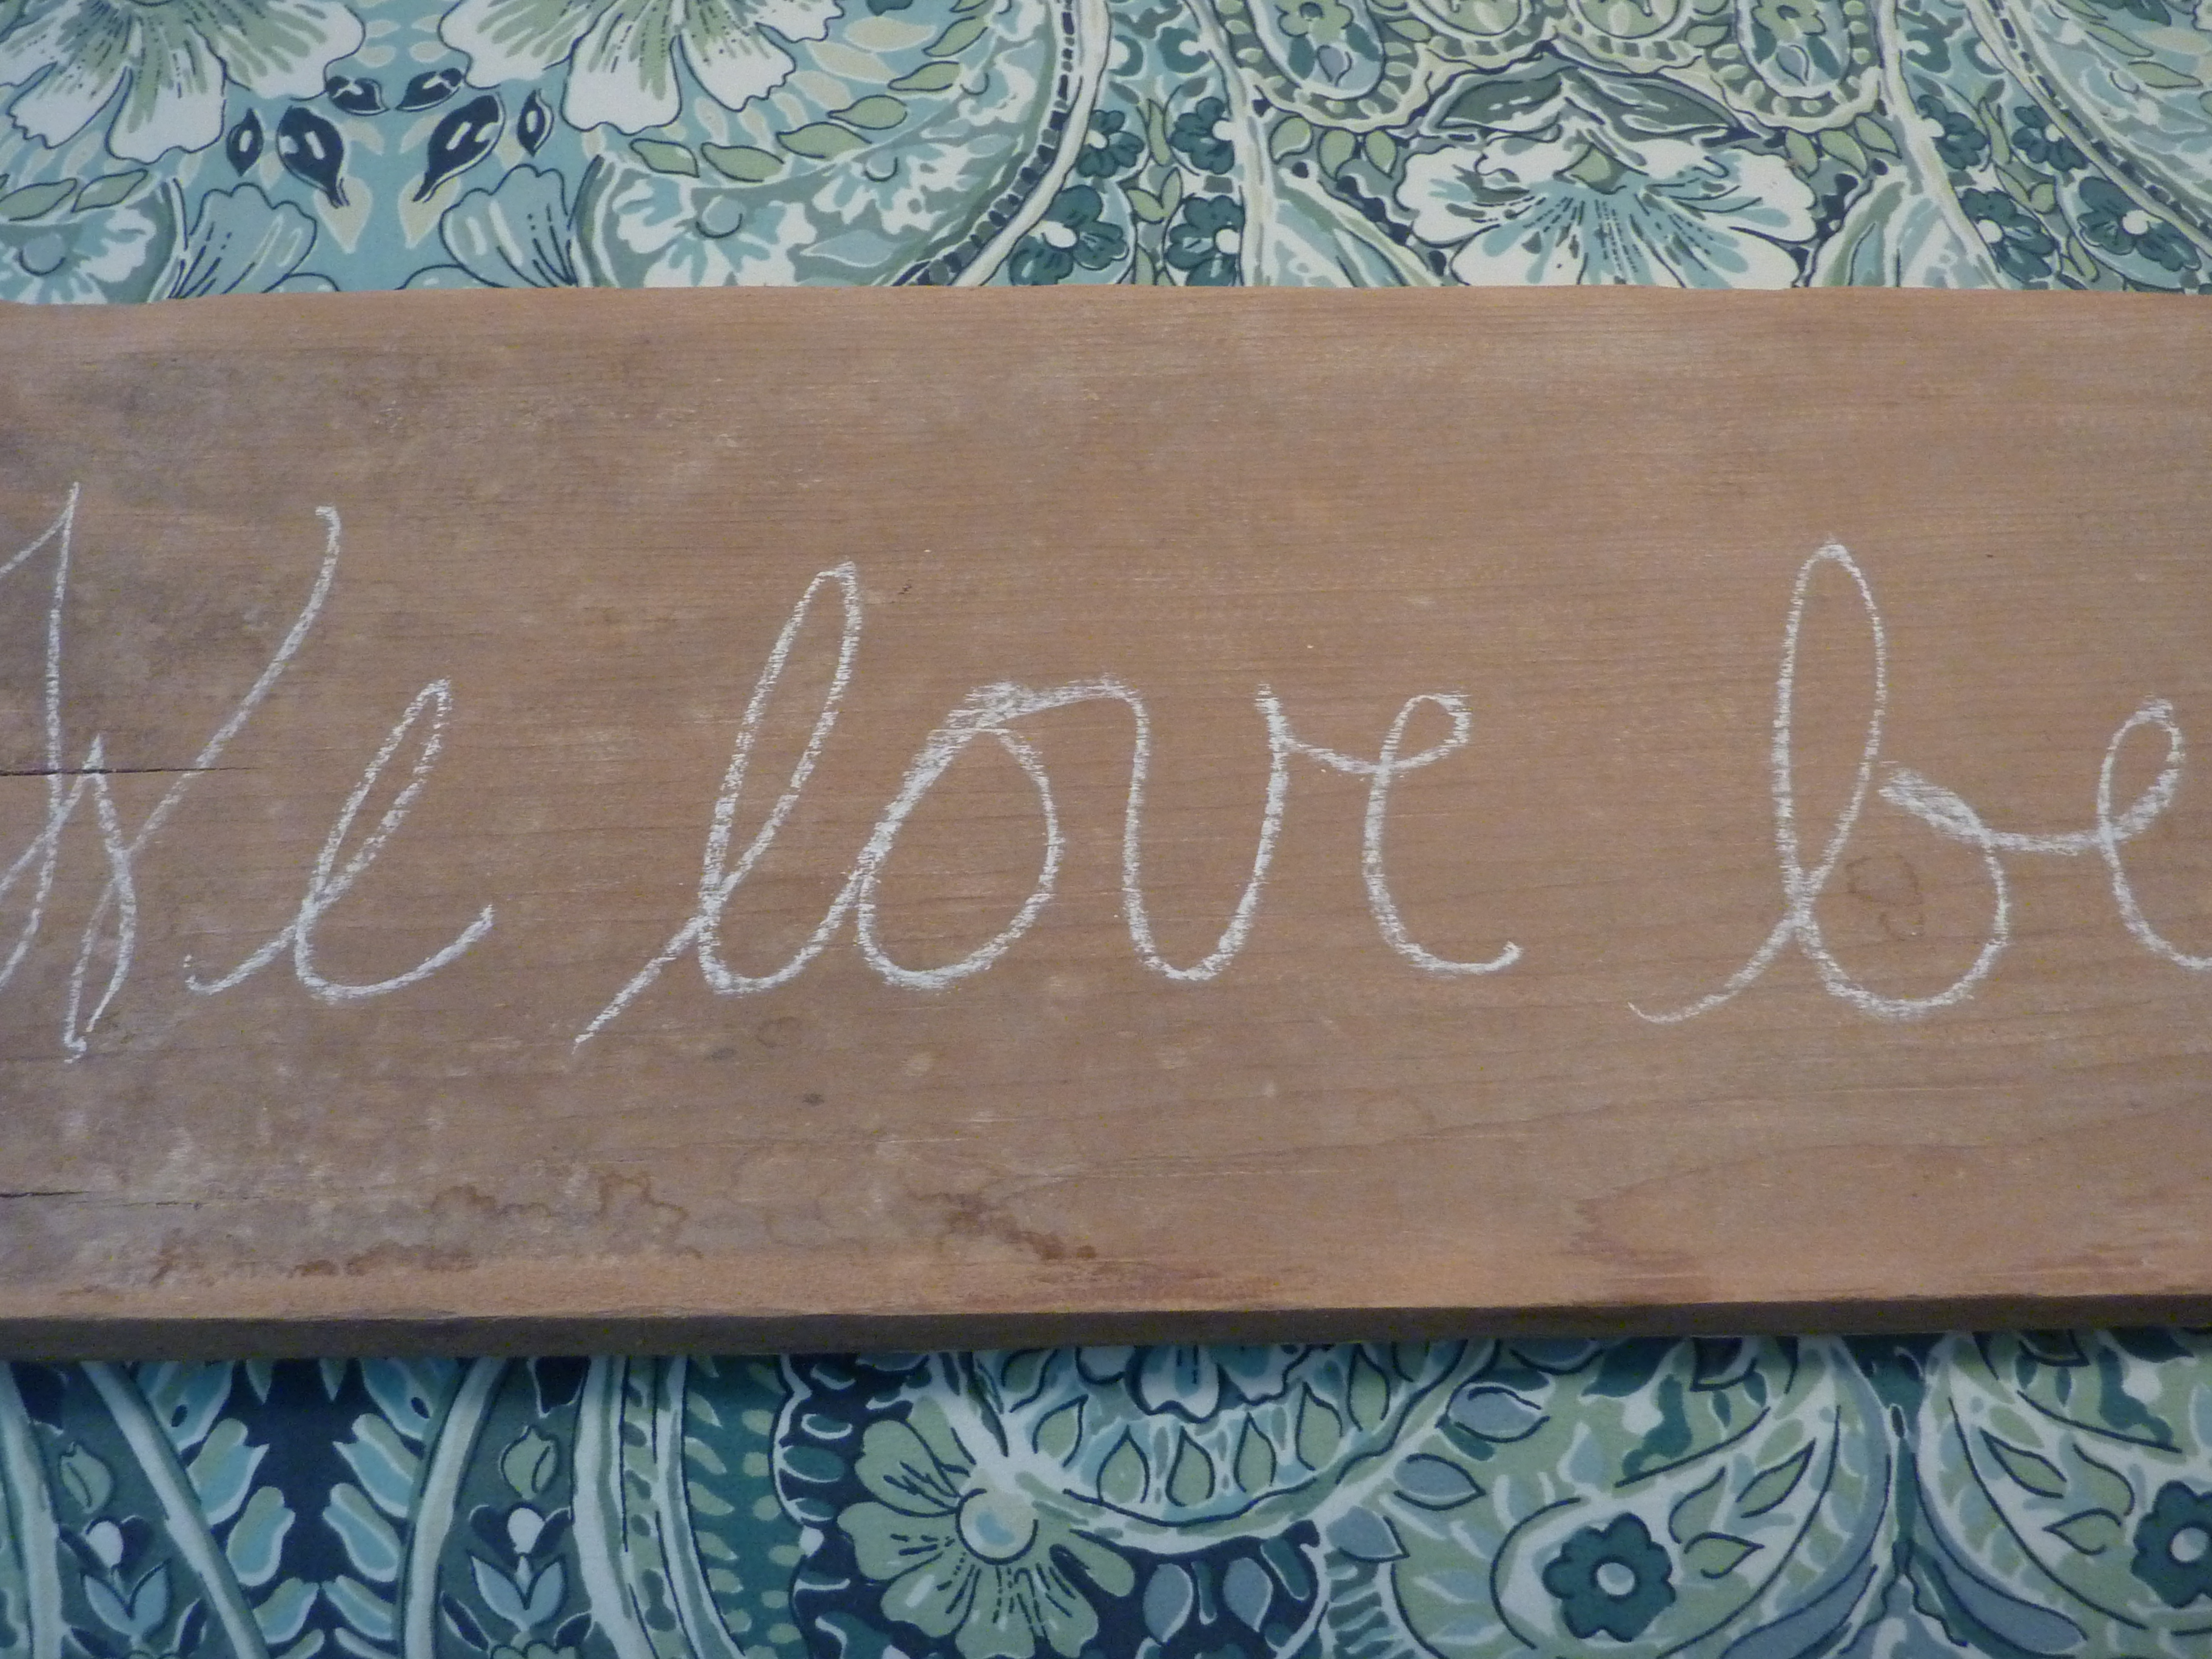 rustic barn wood sign--chalk markings